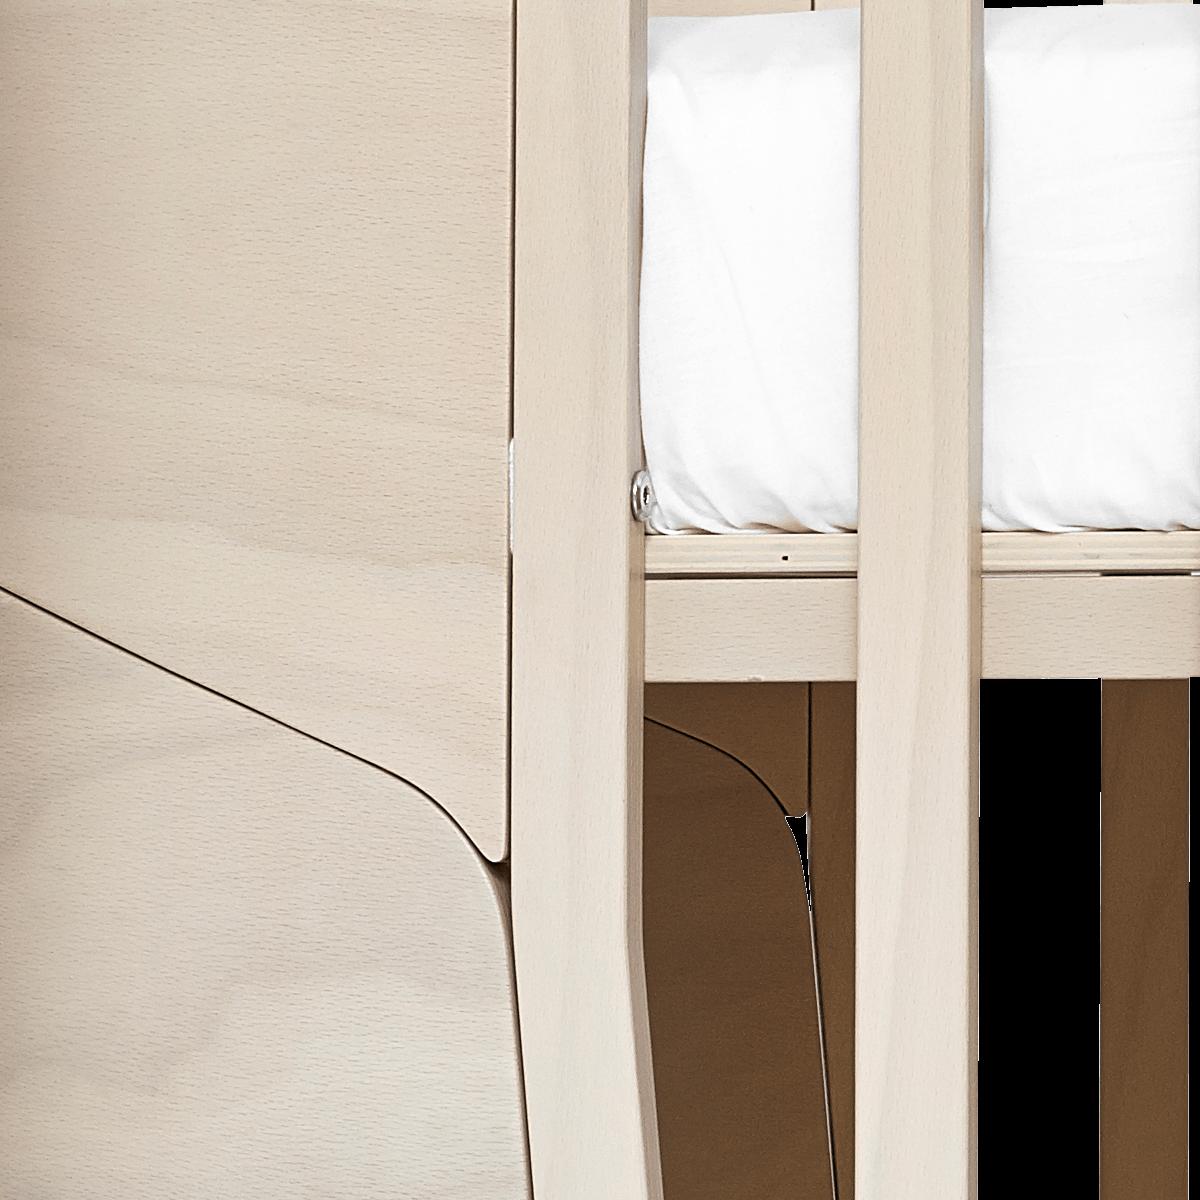 Full Size of Leander Babybett Wird Im Handumdrehen Zum Juniorbett 120x200 Bett Betten Berlin 180x200 Weiß Boxspring Tojo V Podest Günstige 140x200 Bestes Minimalistisch Bett Leander Bett